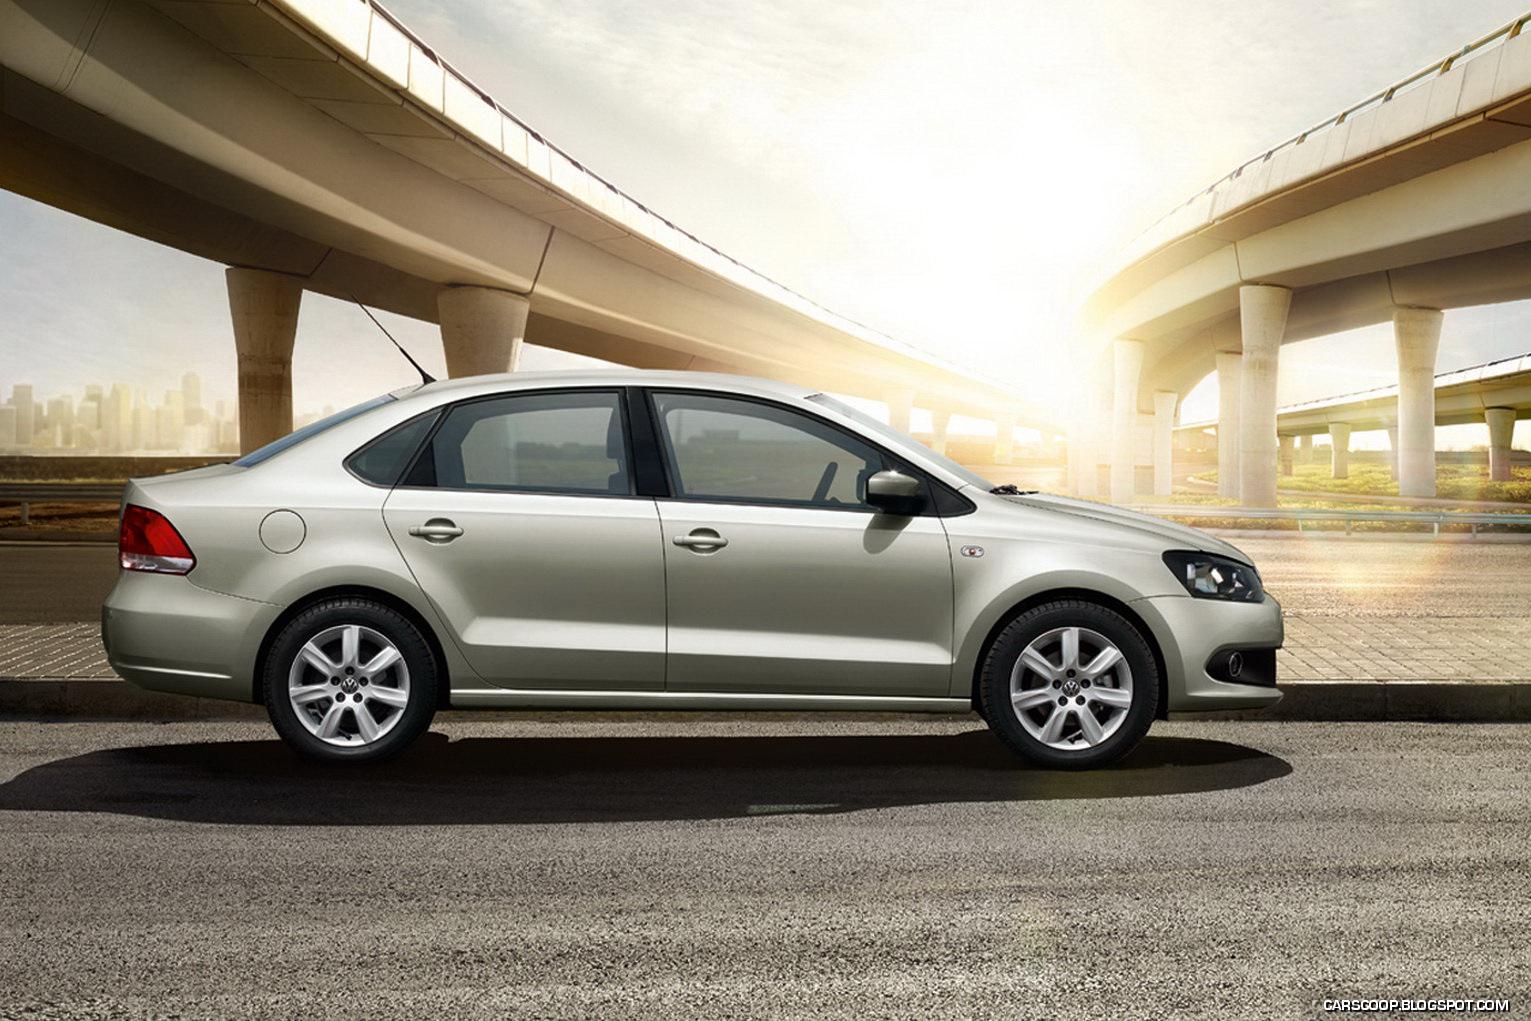 vw polo sedan  photo gallery  info  india market version   resurrects